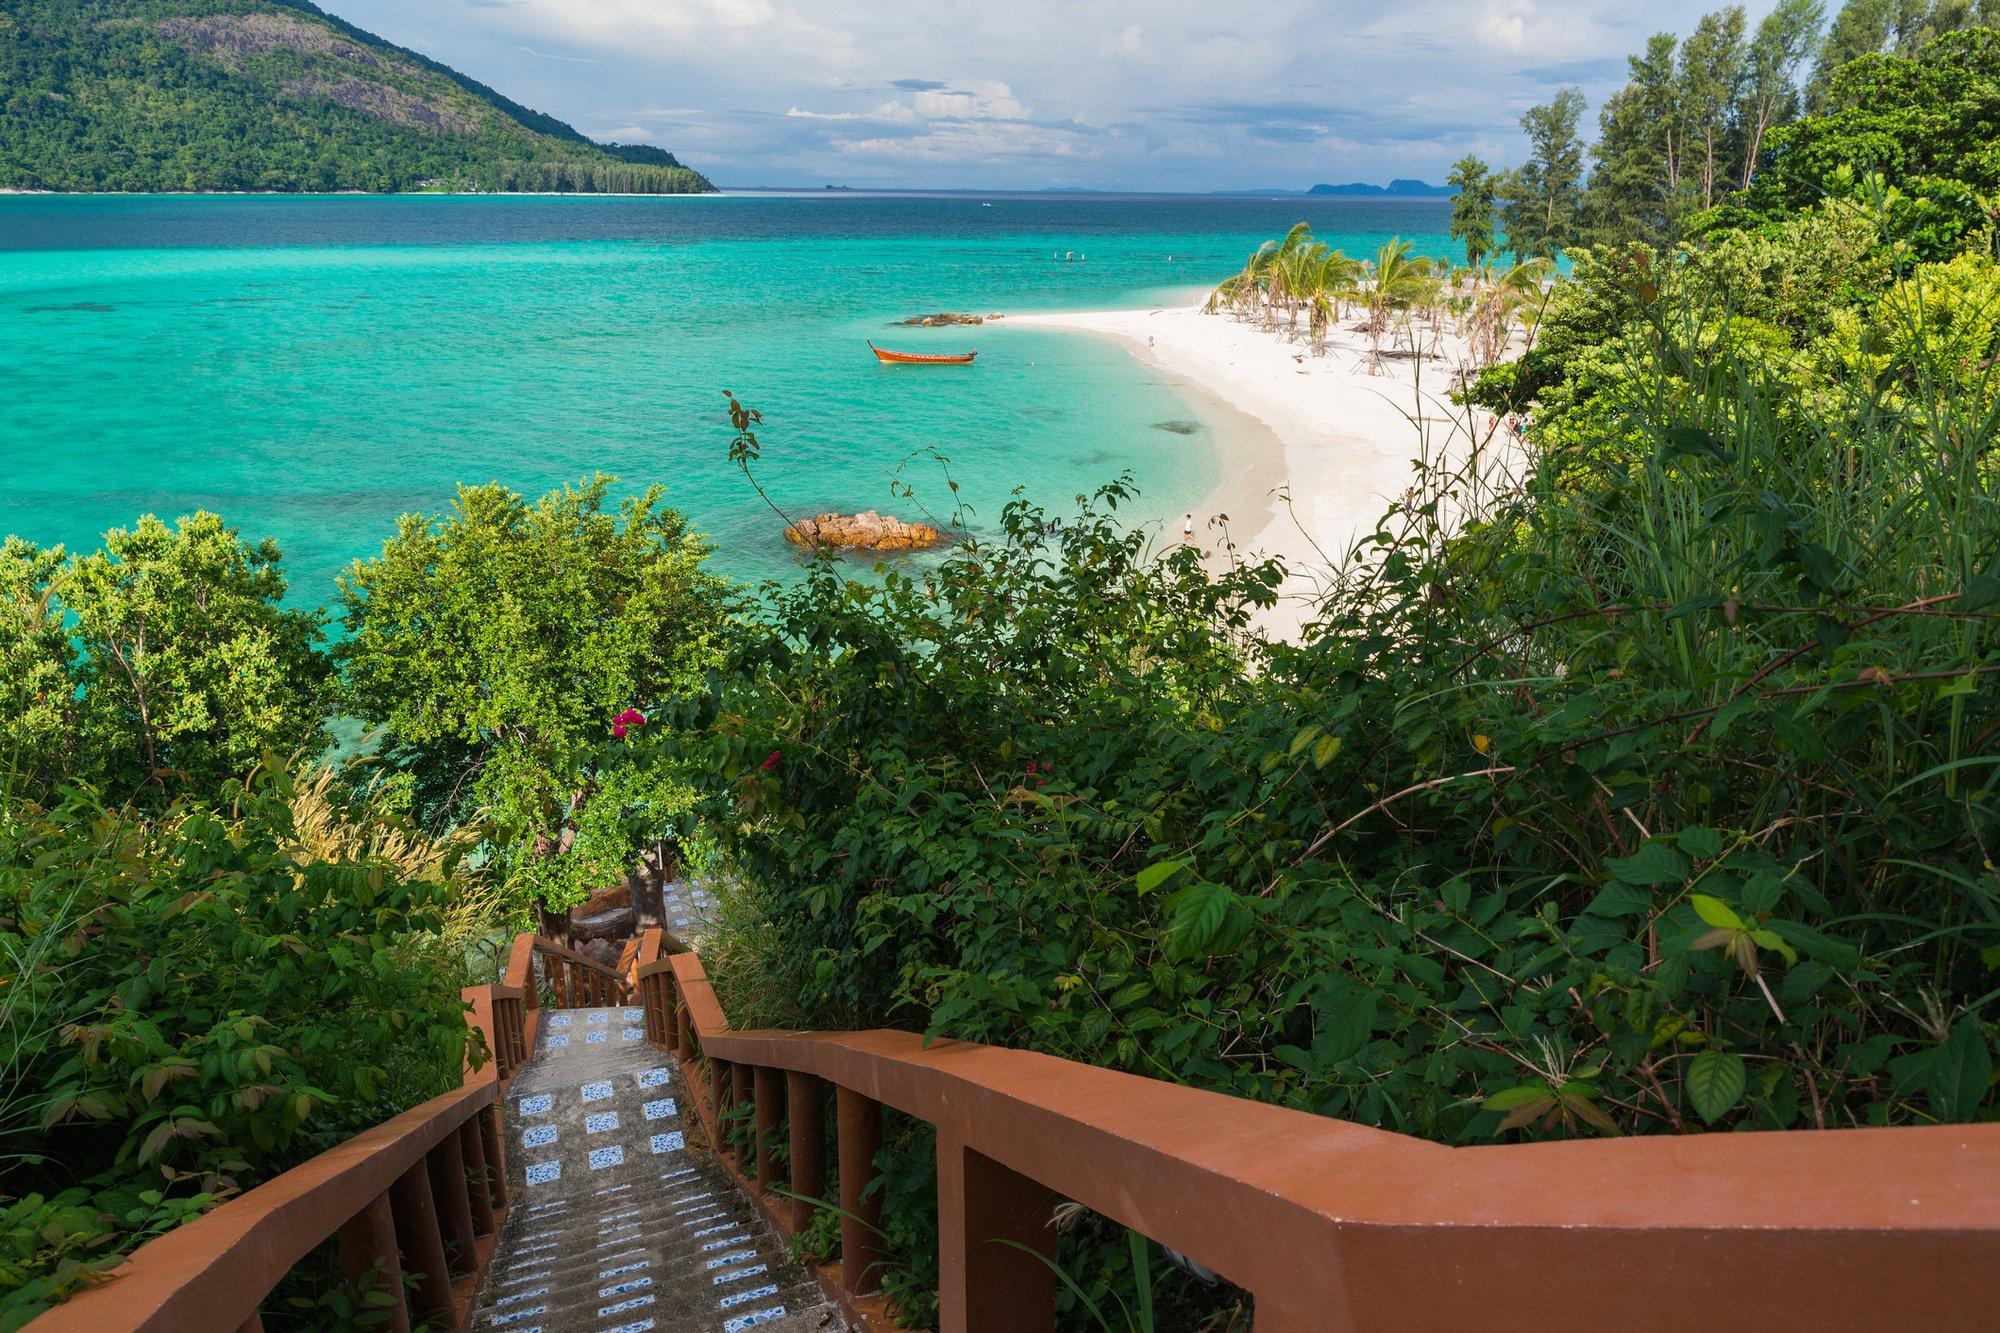 Koh Lipe-beach, Getty Images